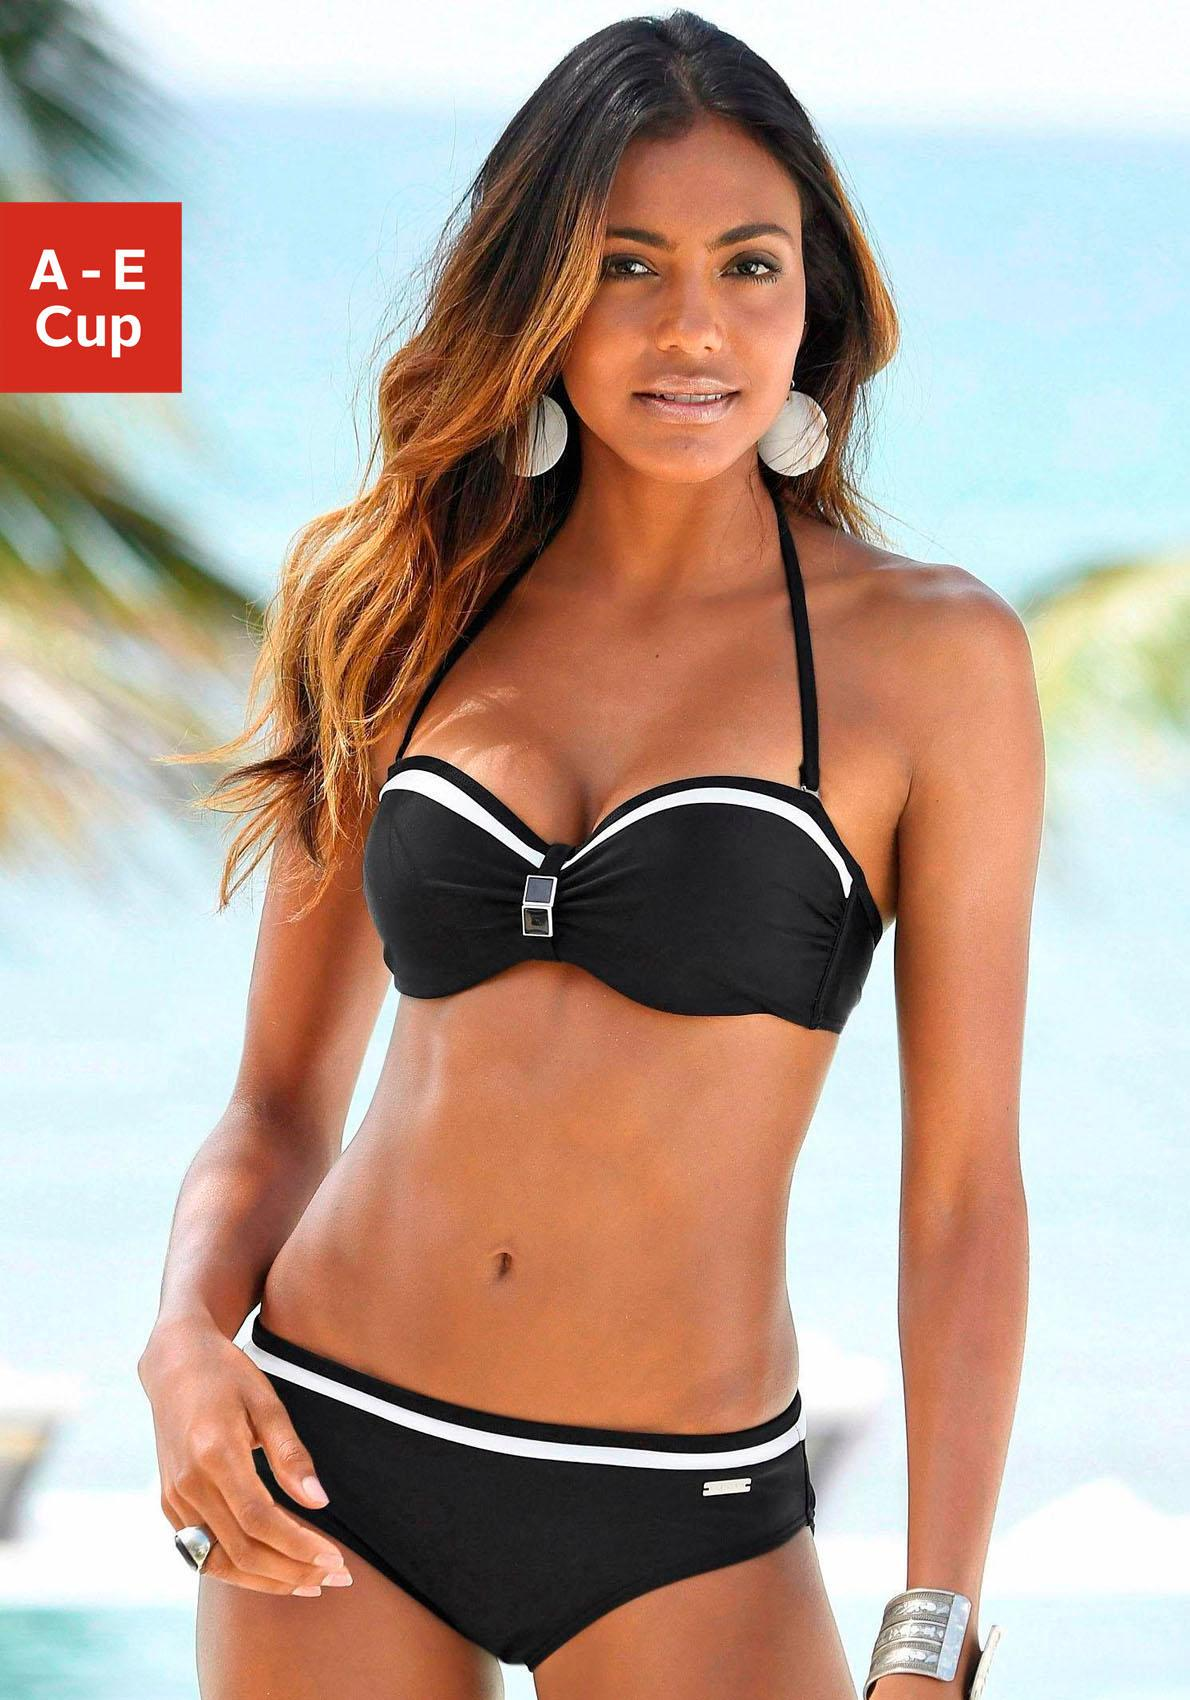 LASCANA Bügel-Bandeau-Bikini mit Kontrastdetails